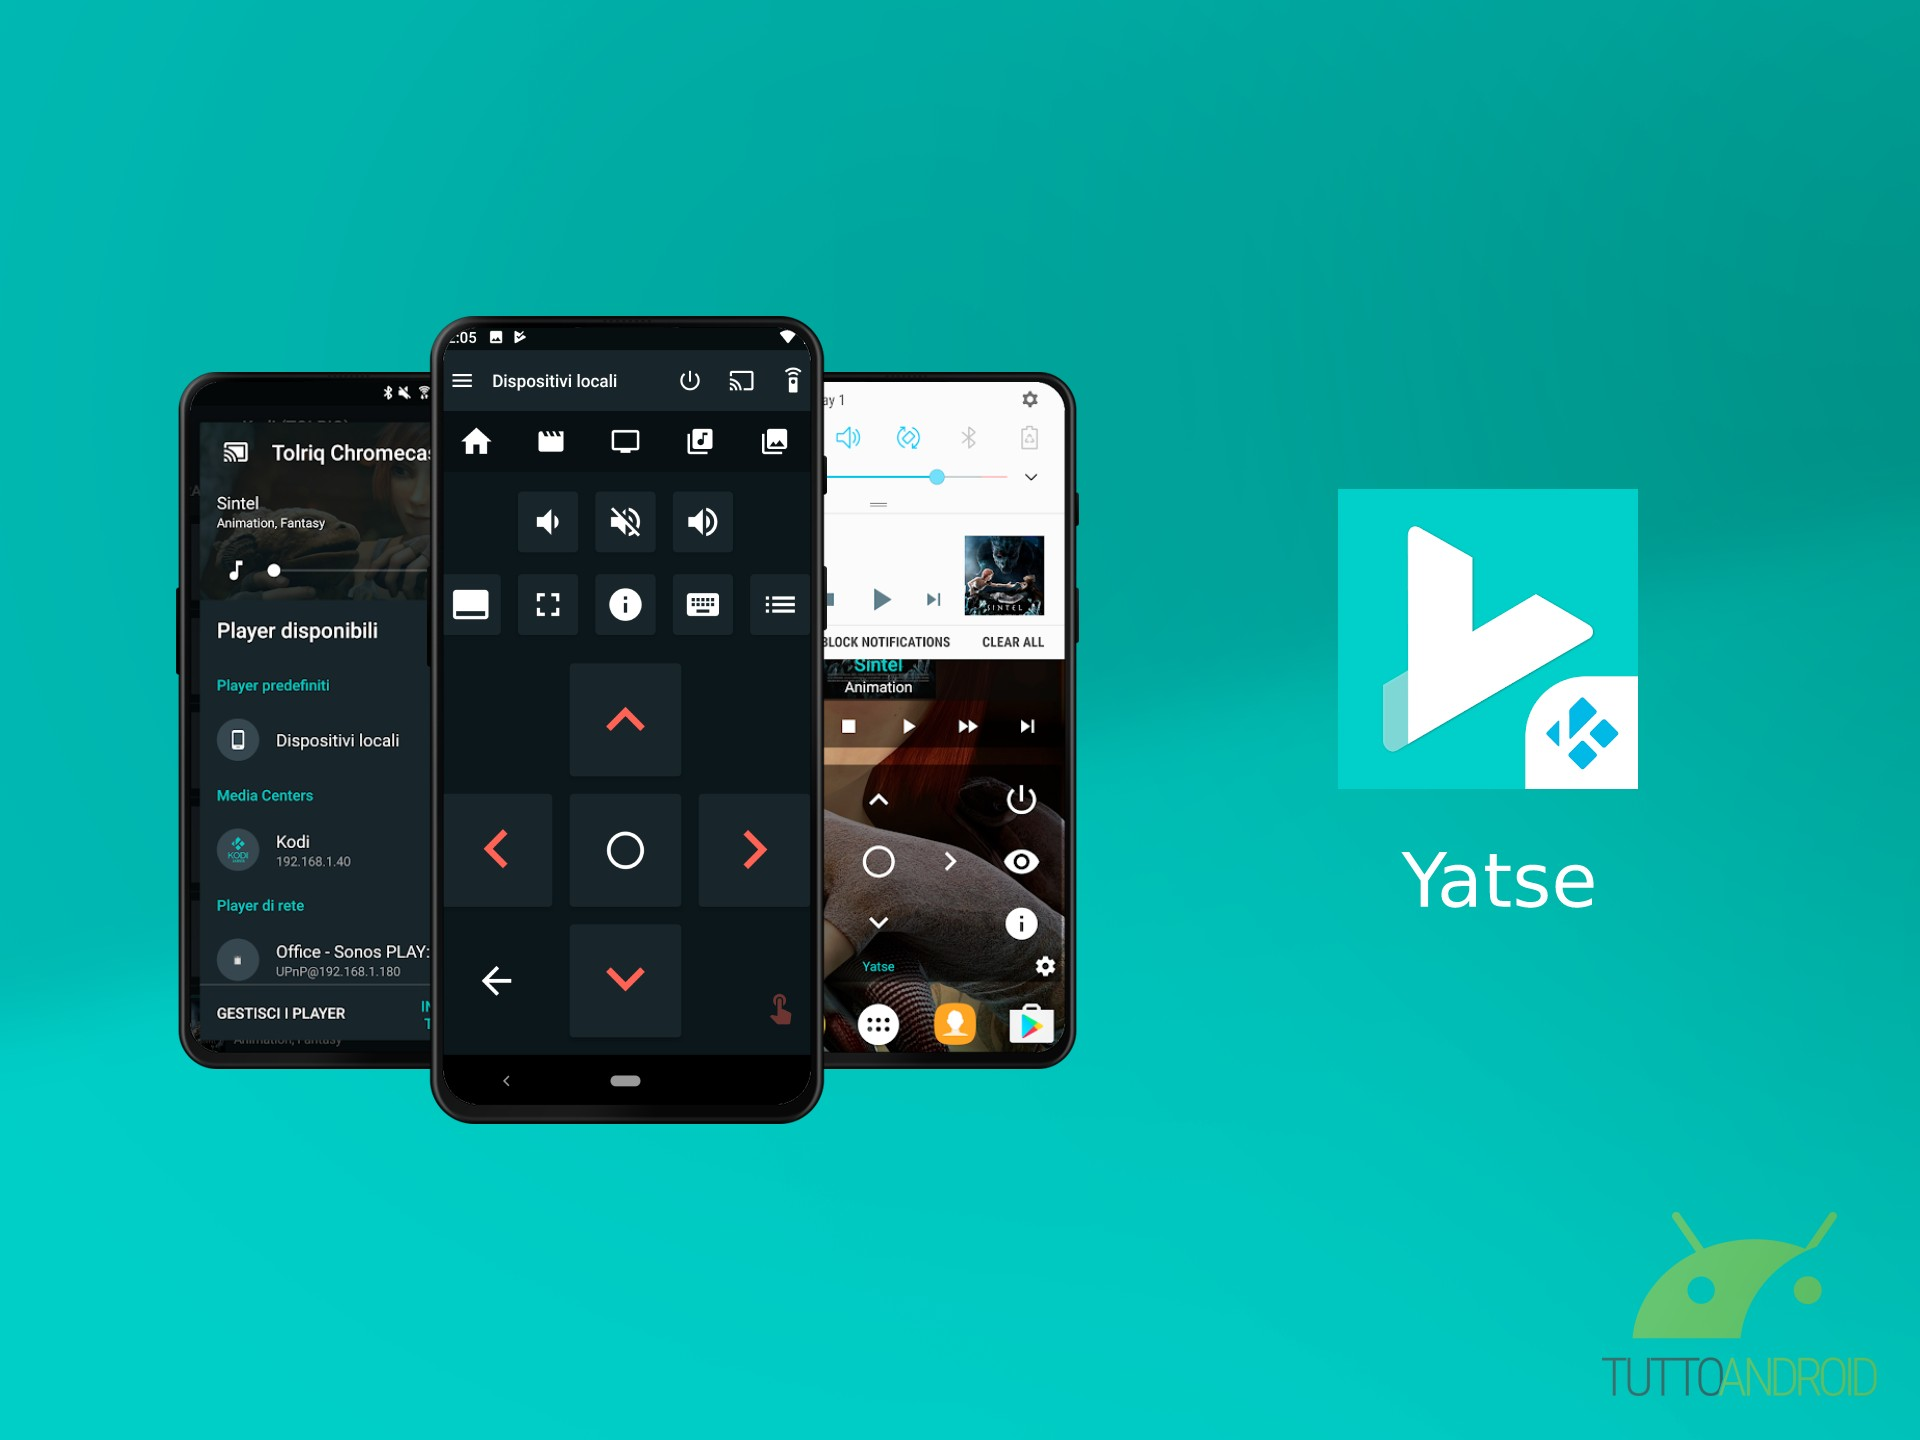 Yatse app